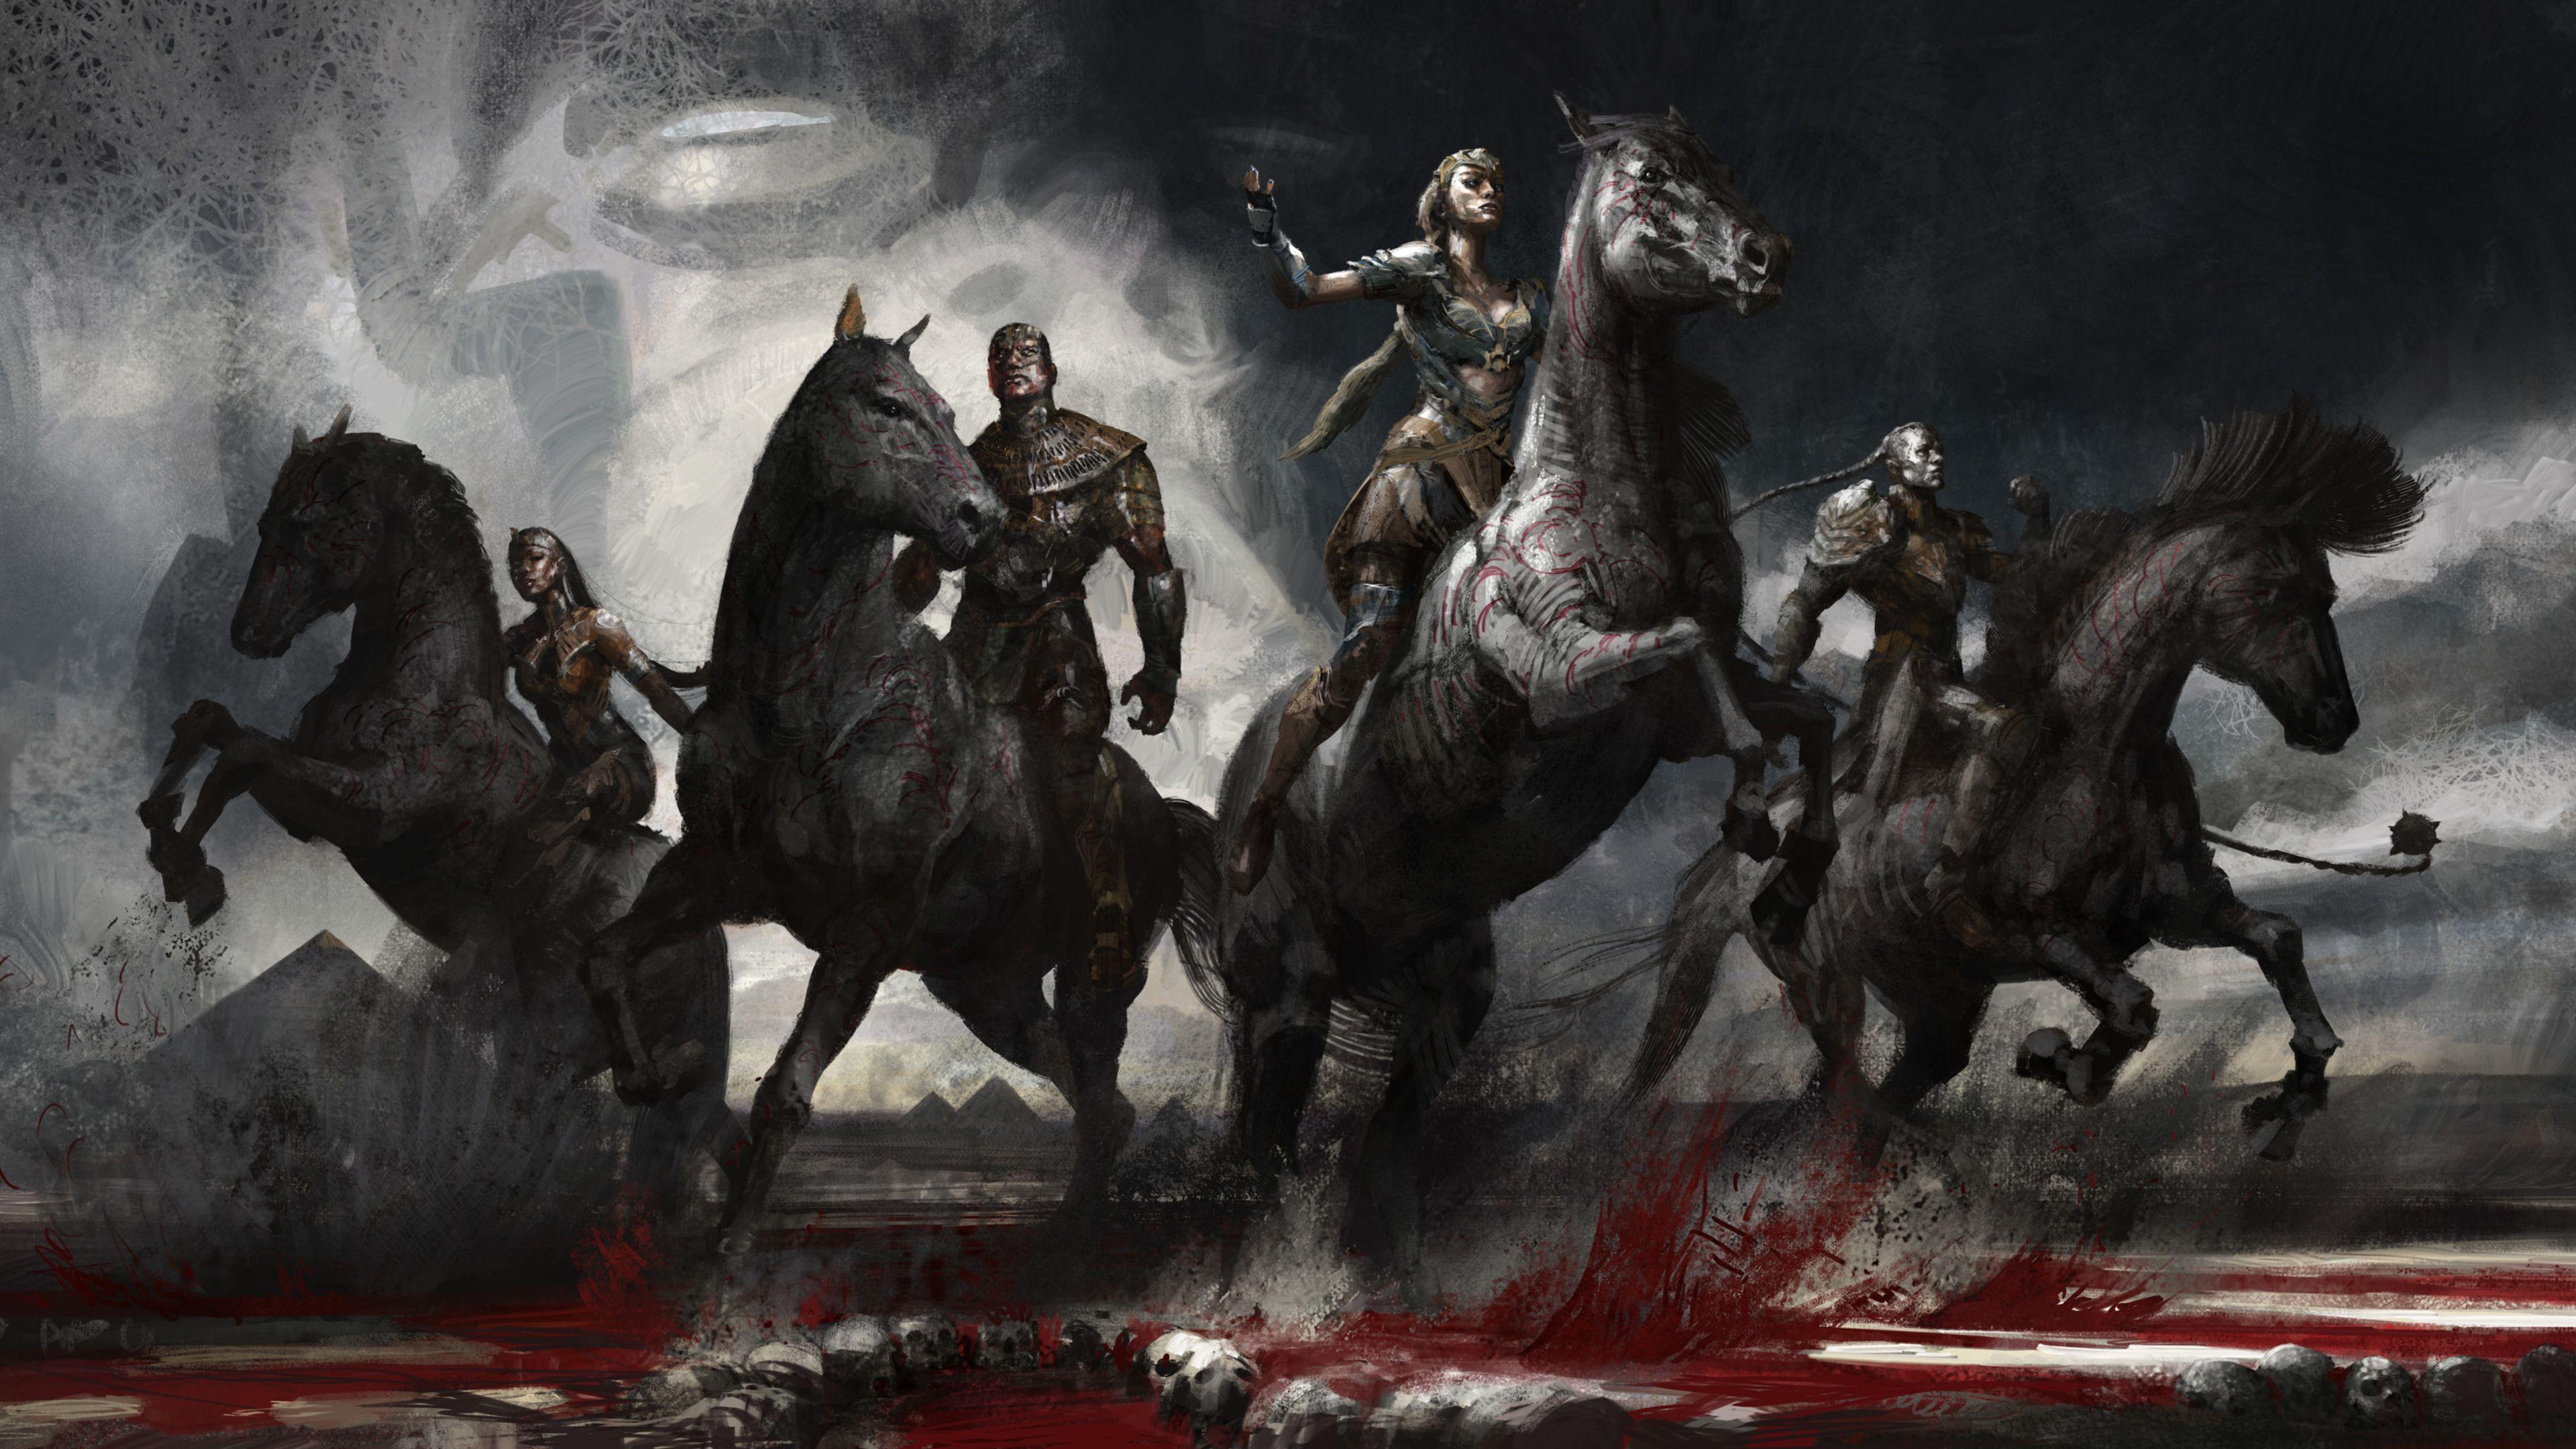 X Men Apocalypse Ancient Horsemen 4k X Men Apocalypse Wallpapers Horse Wallpapers Hd Wallpapers Digital Art Wallpapers D Horse Wallpaper Dark Wallpaper Art